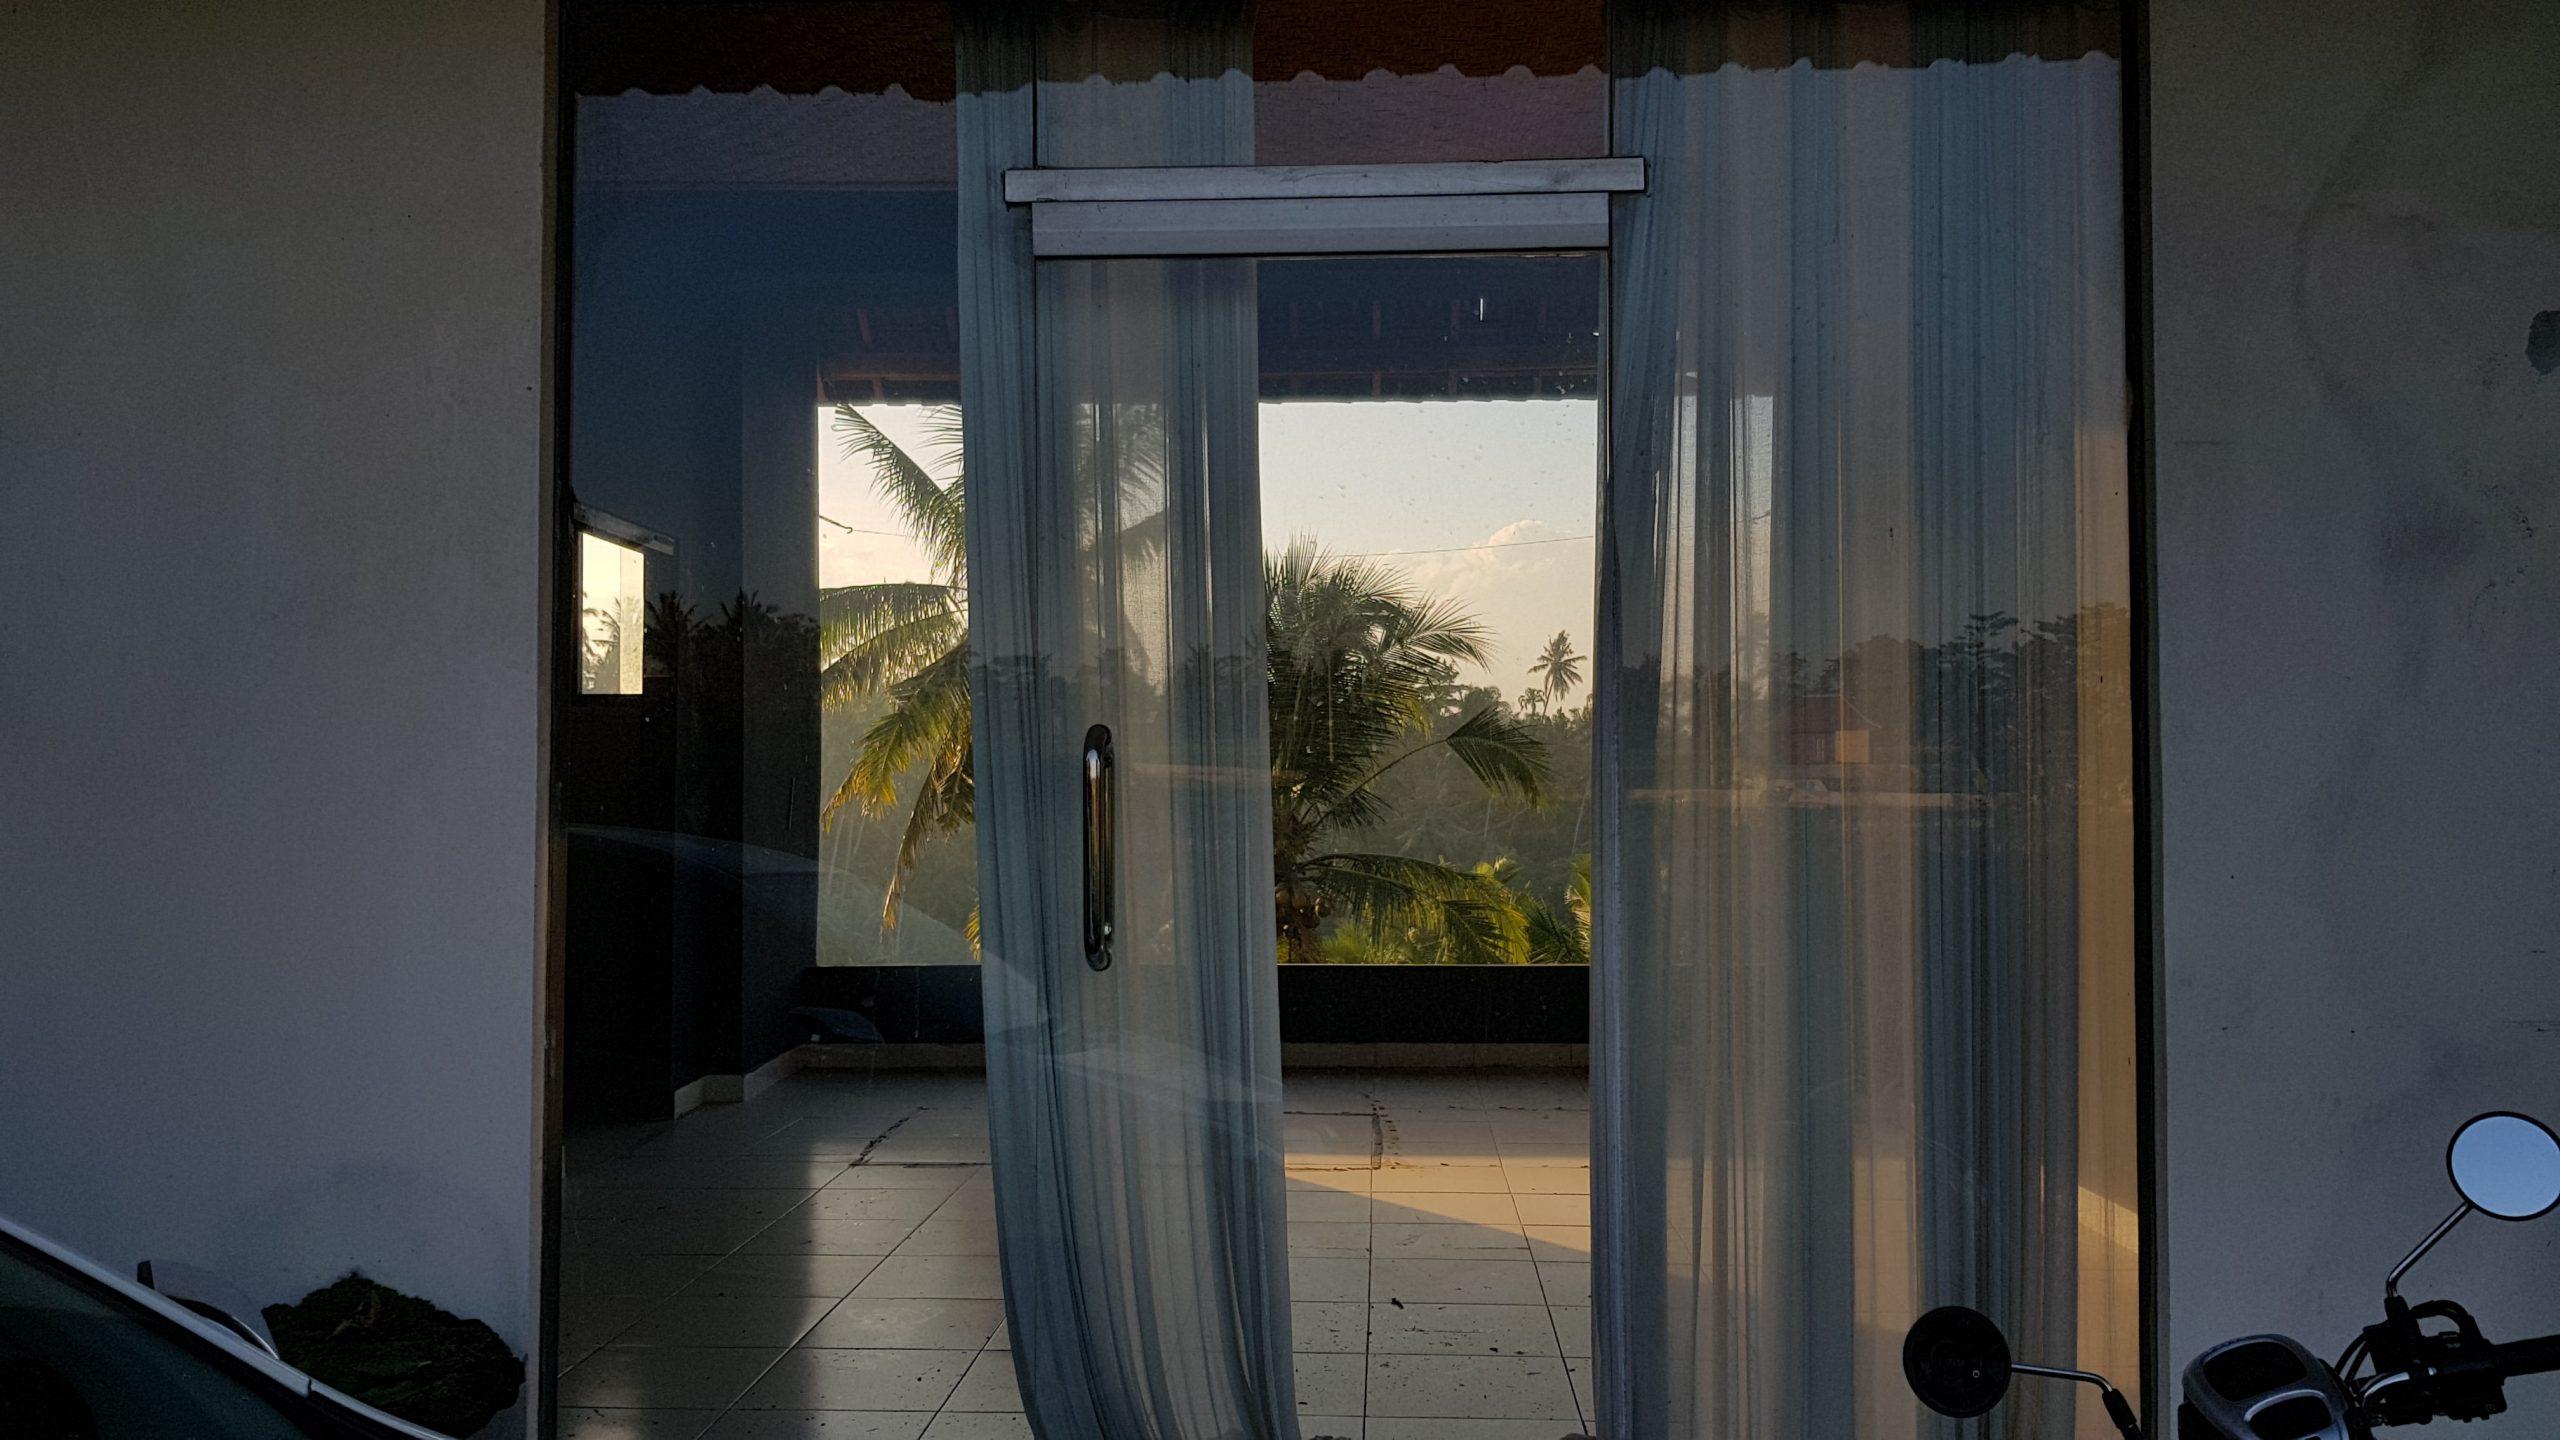 Best Ways to Secure a Sliding Glass Door